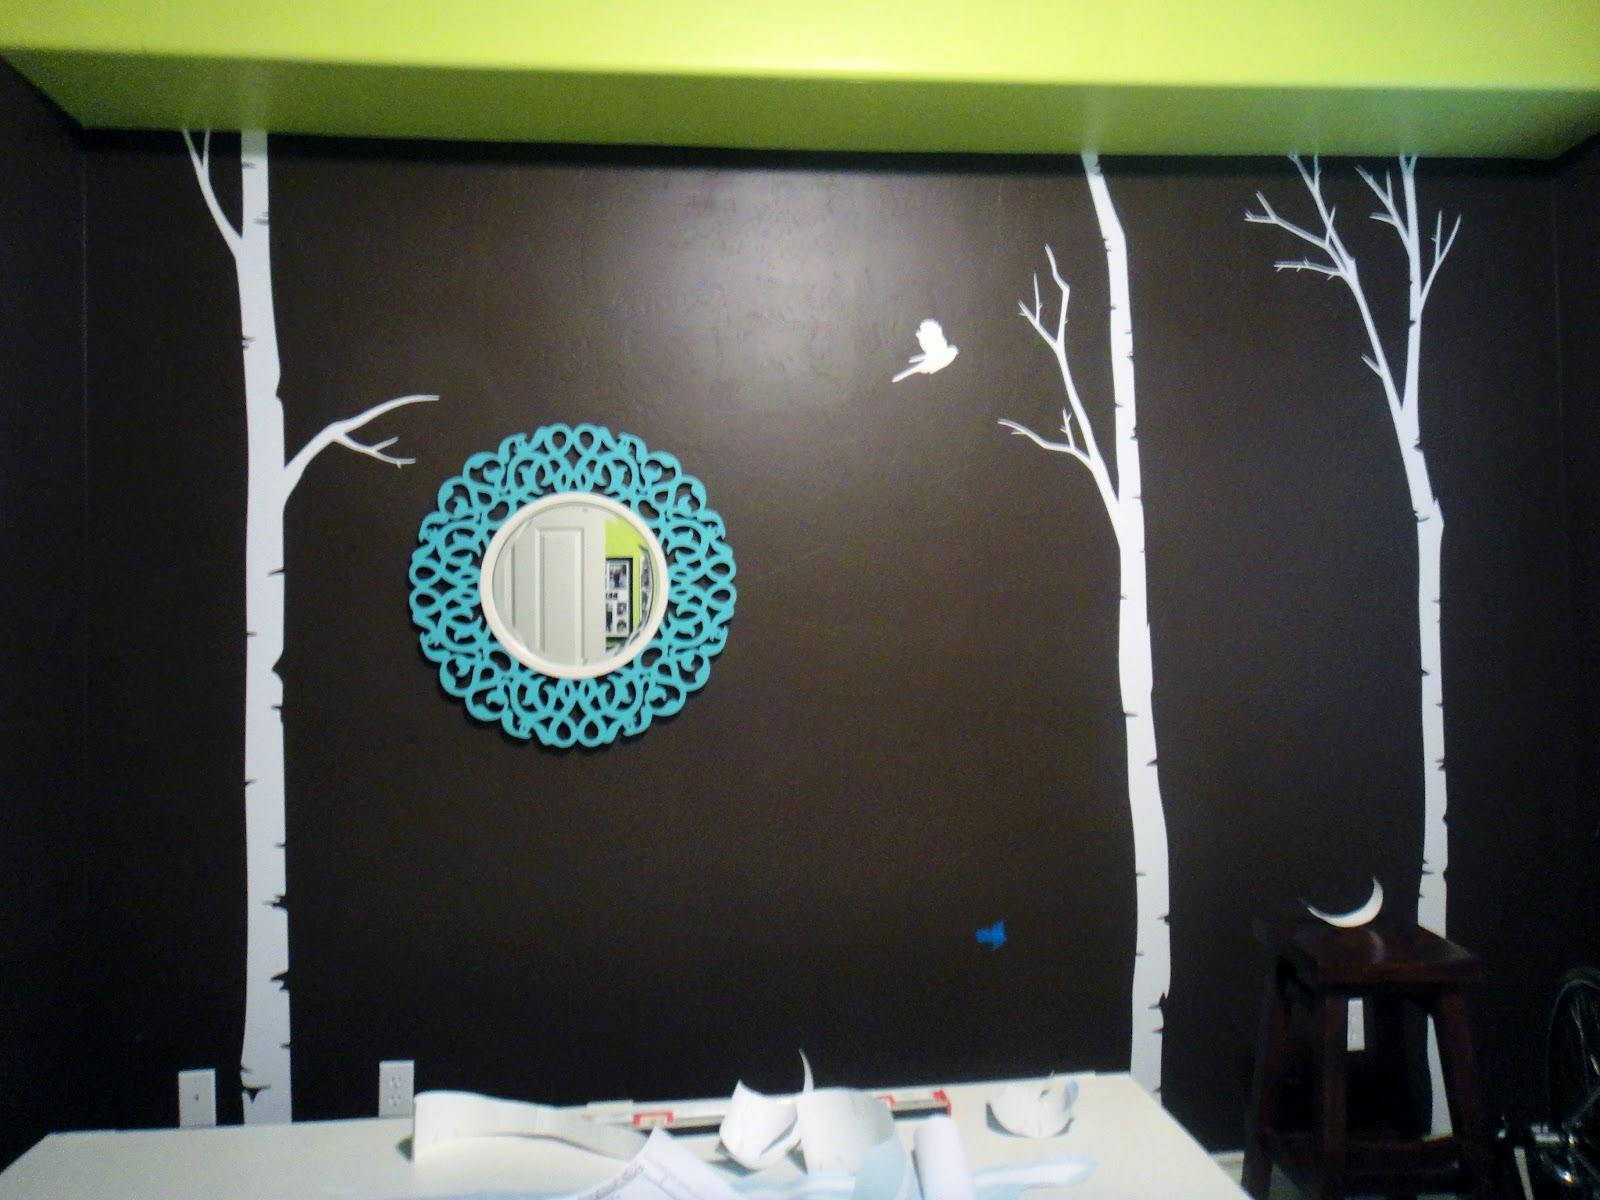 Spectacular Playroom Wall Adding the Vinyl Trees